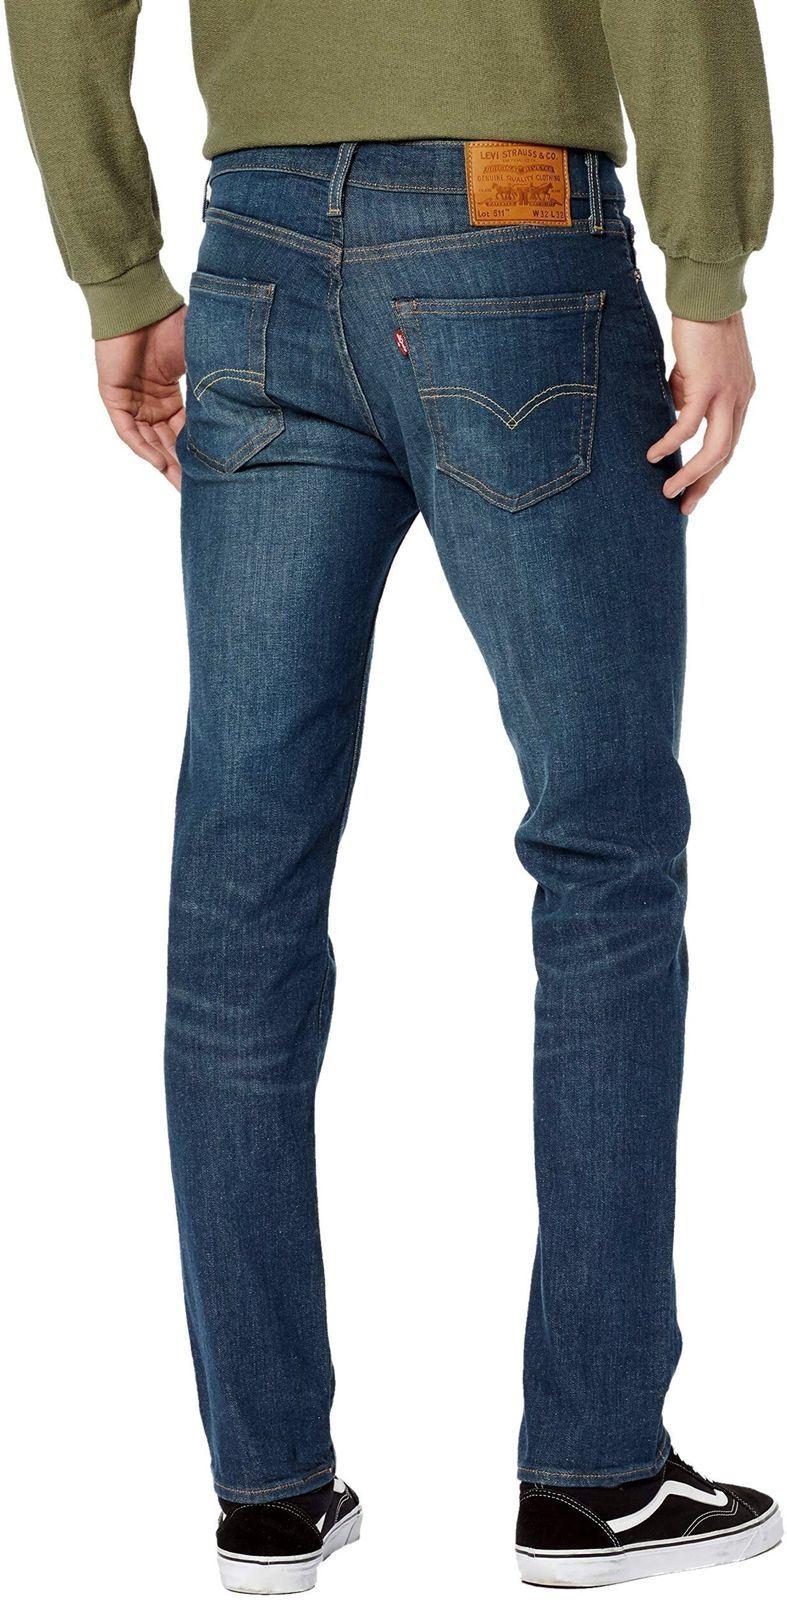 Levi-039-s-511-Slim-Fit-Denim-Jeans-estilos-surtidos miniatura 5